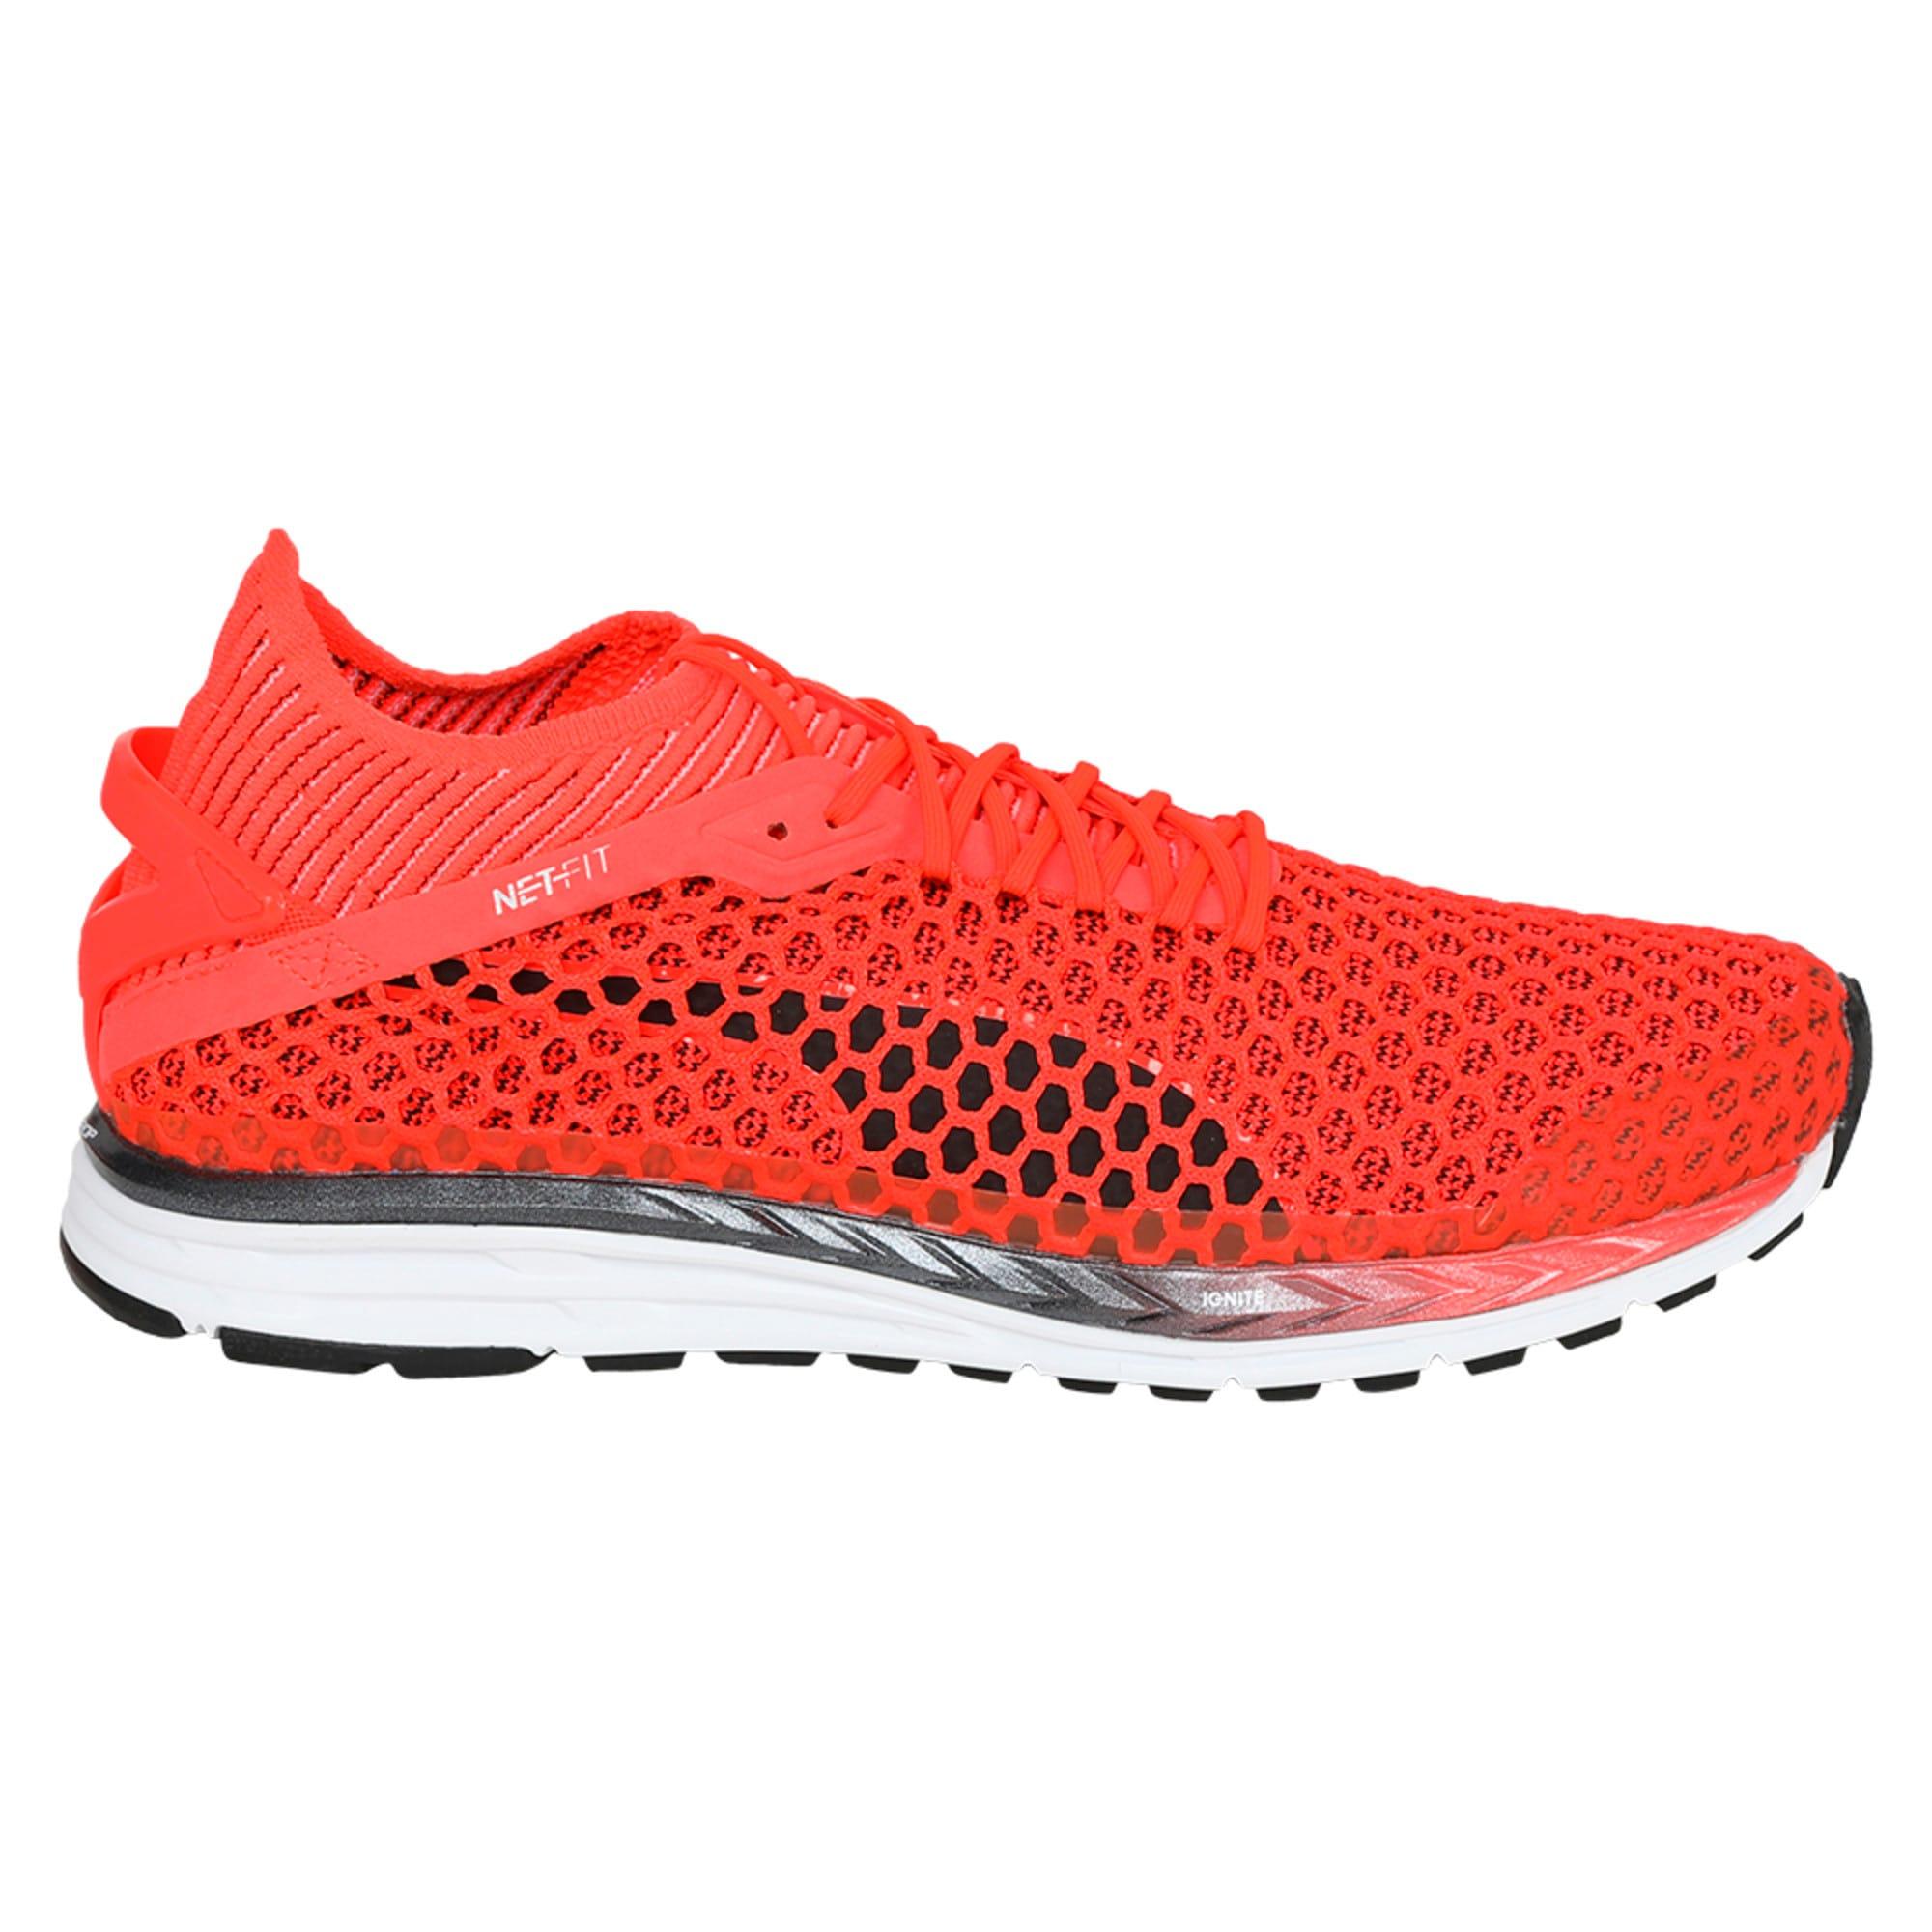 Thumbnail 5 of Speed IGNITE NETFIT 2 Men's Running Shoes, Red Blast-White-Black, medium-IND